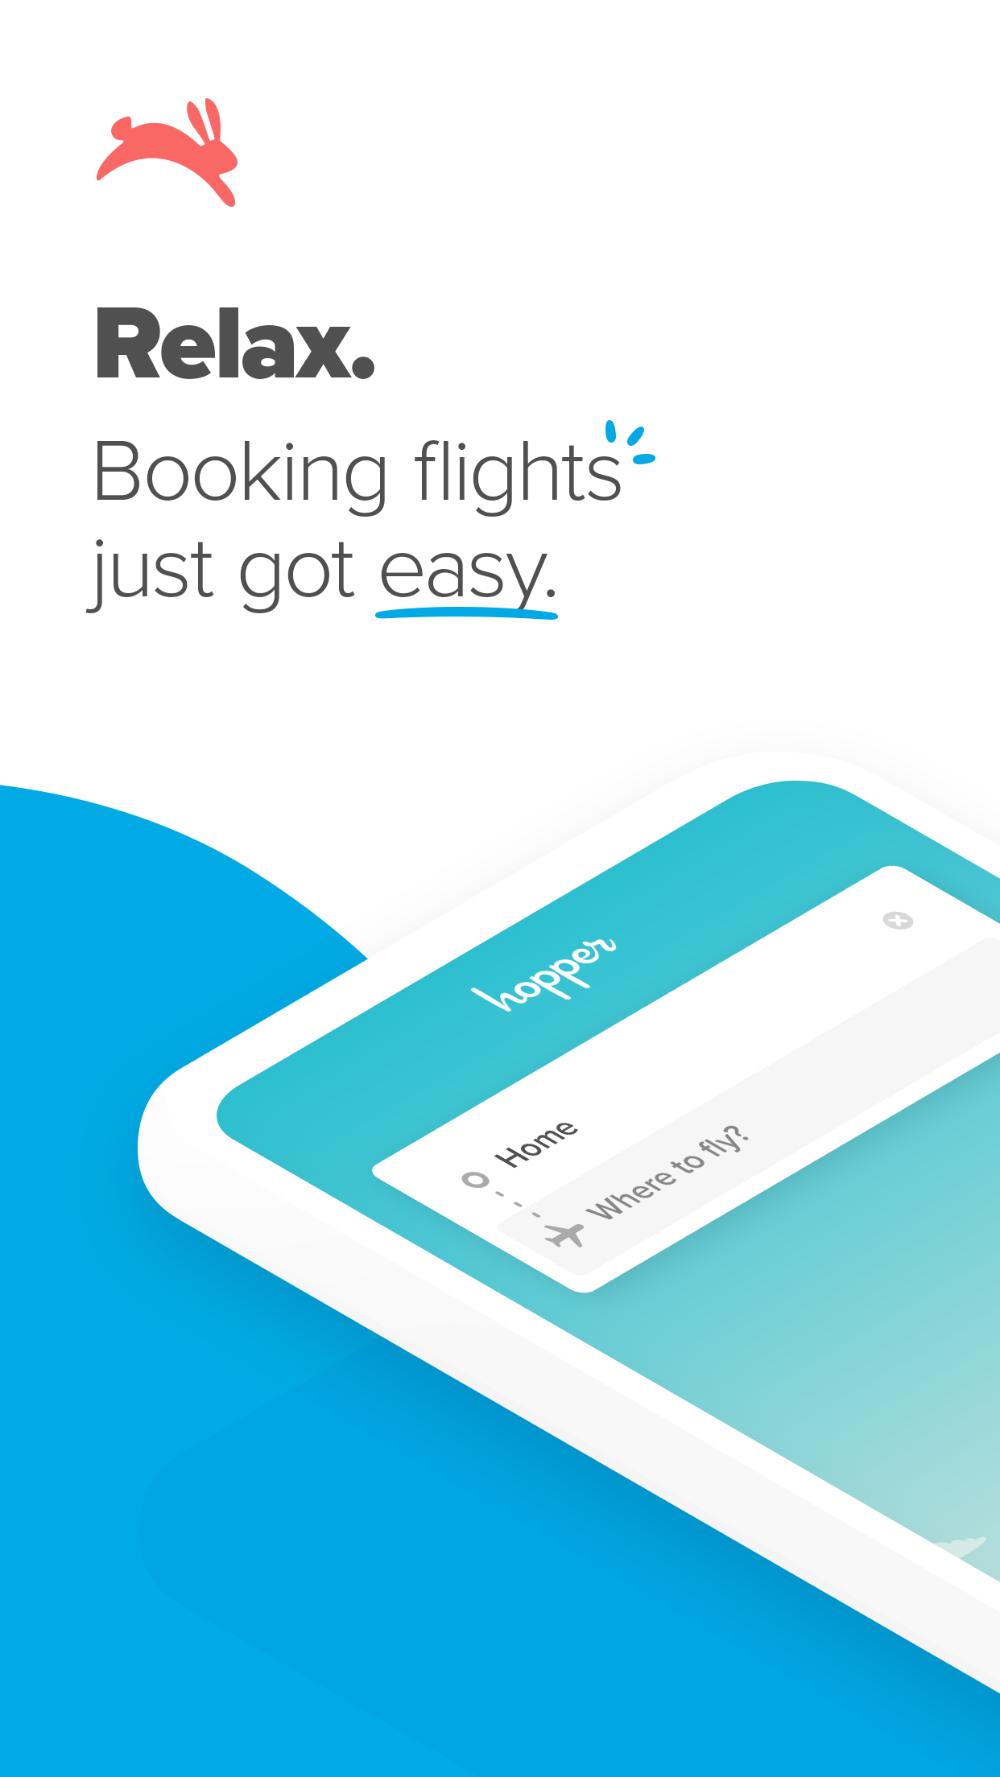 Hopper Book Flights Google Play 上的应用 Booking flights